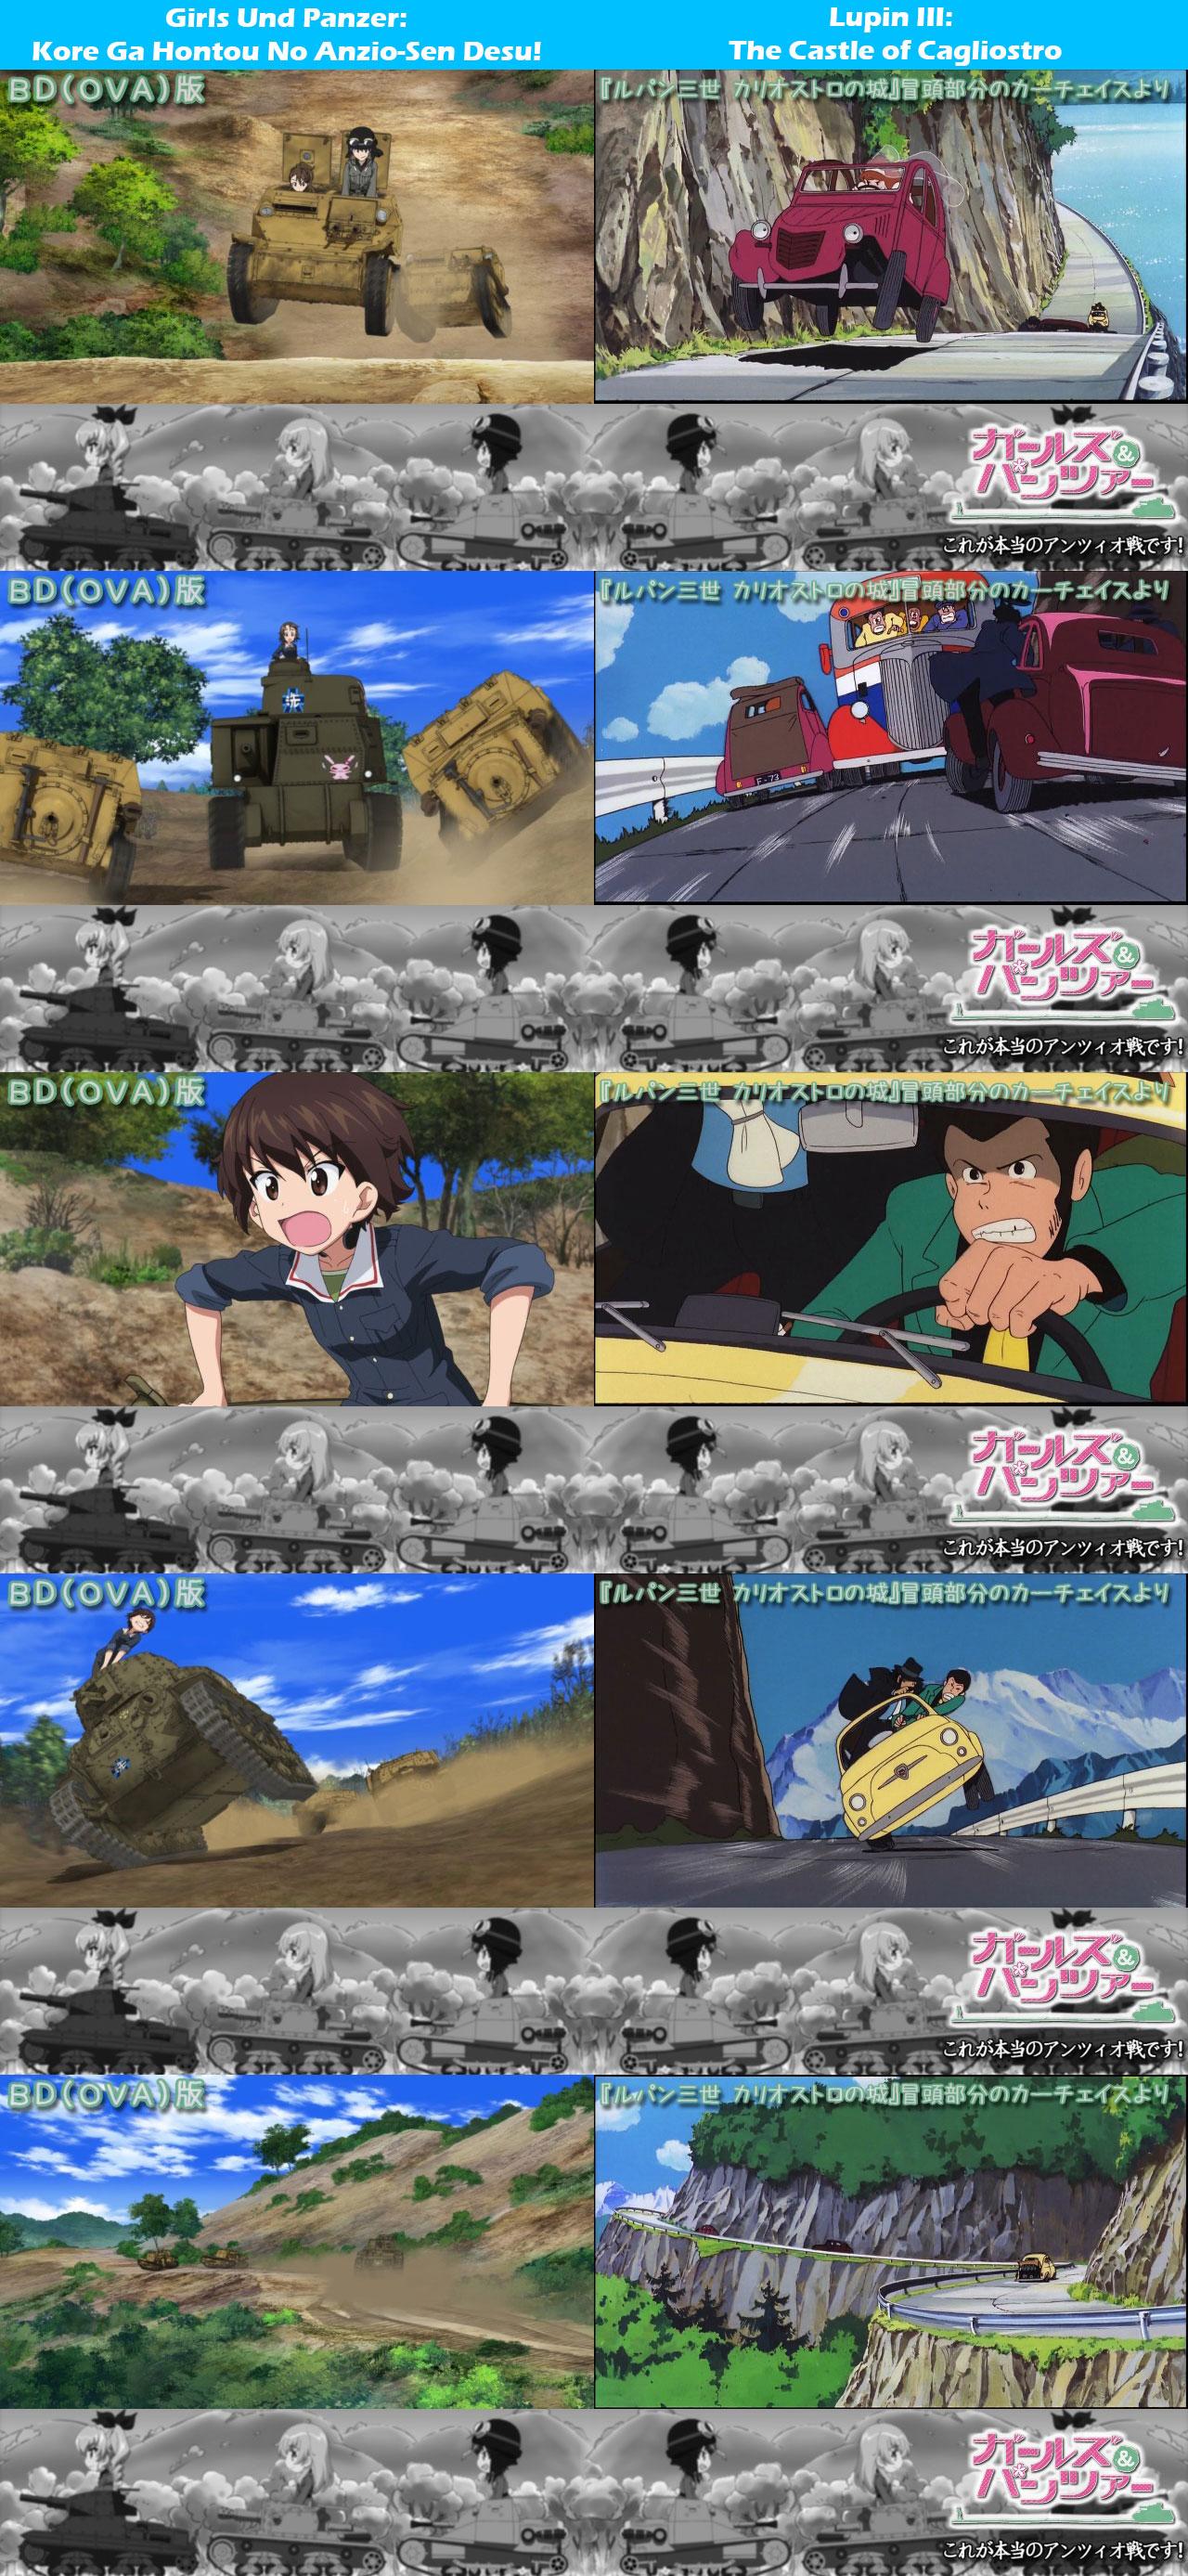 Girls-Und-Panzer-Kore-Ga-Hontou-No-Anzio-Sen-Desu-Lupin-III-The-Castle-of-Cagliostro-Homage-Comparison_Haruhichan.com